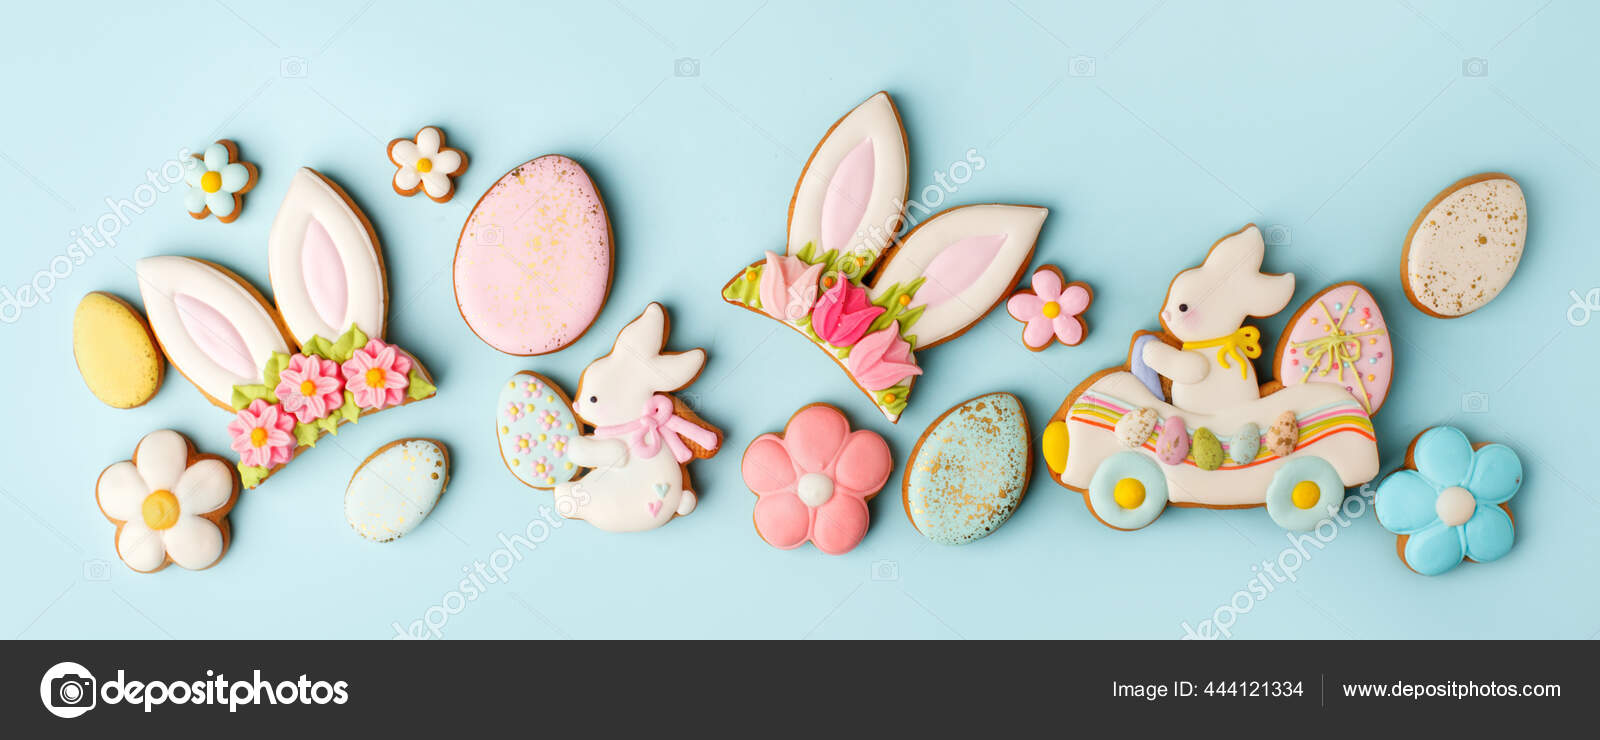 depositphotos 444121334 stock photo happy easter set cookies 2021